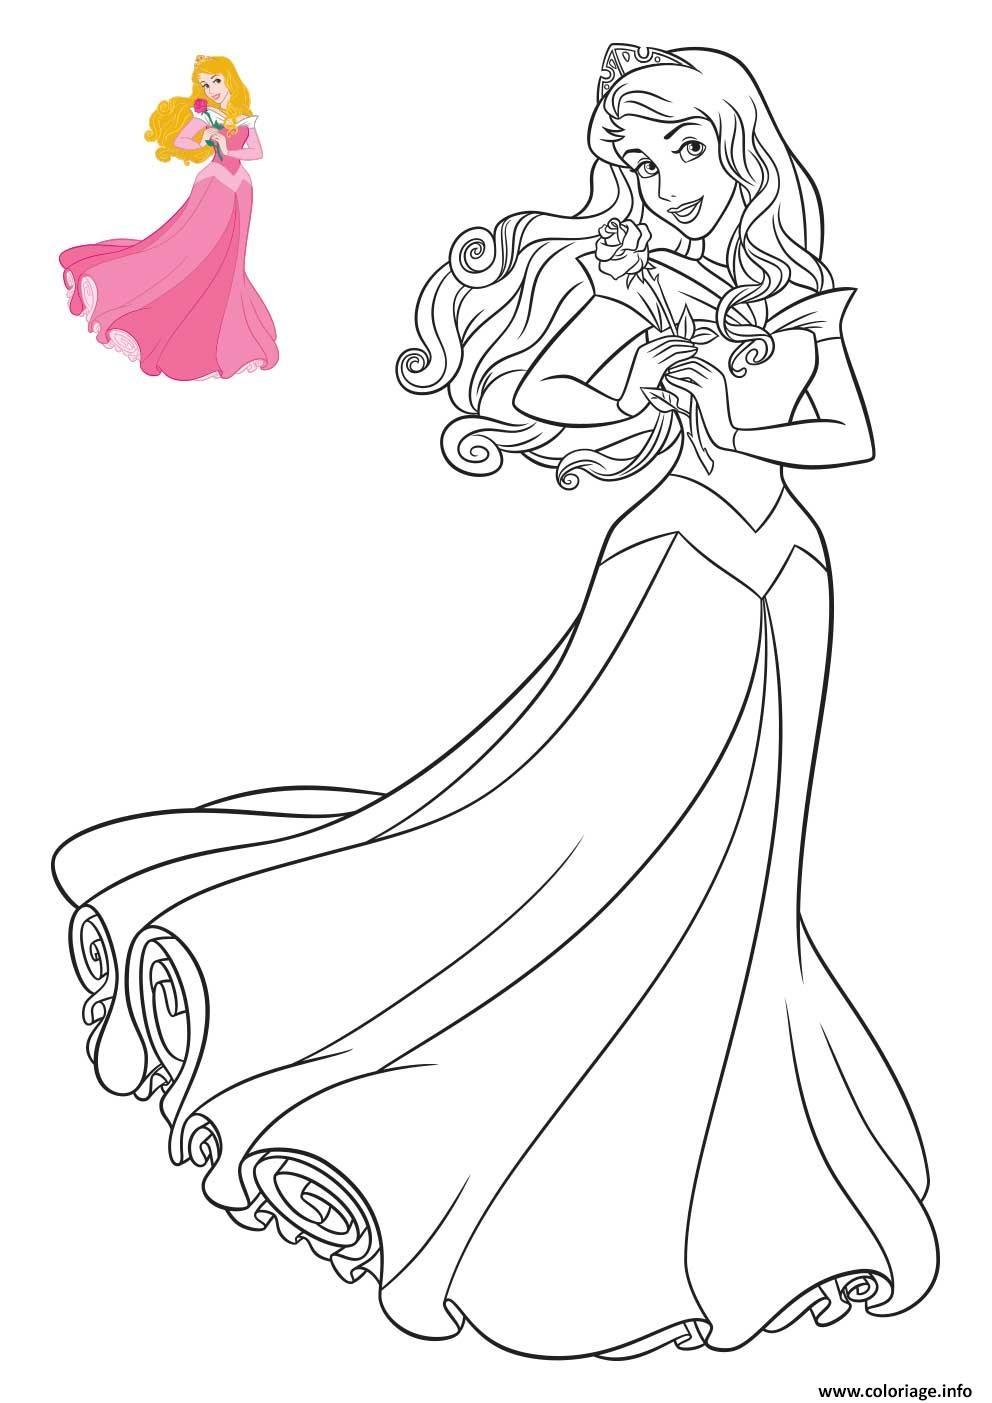 Coloriage Princesse Disney Aurore Dessin concernant Coloriage Princesses Disney À Imprimer